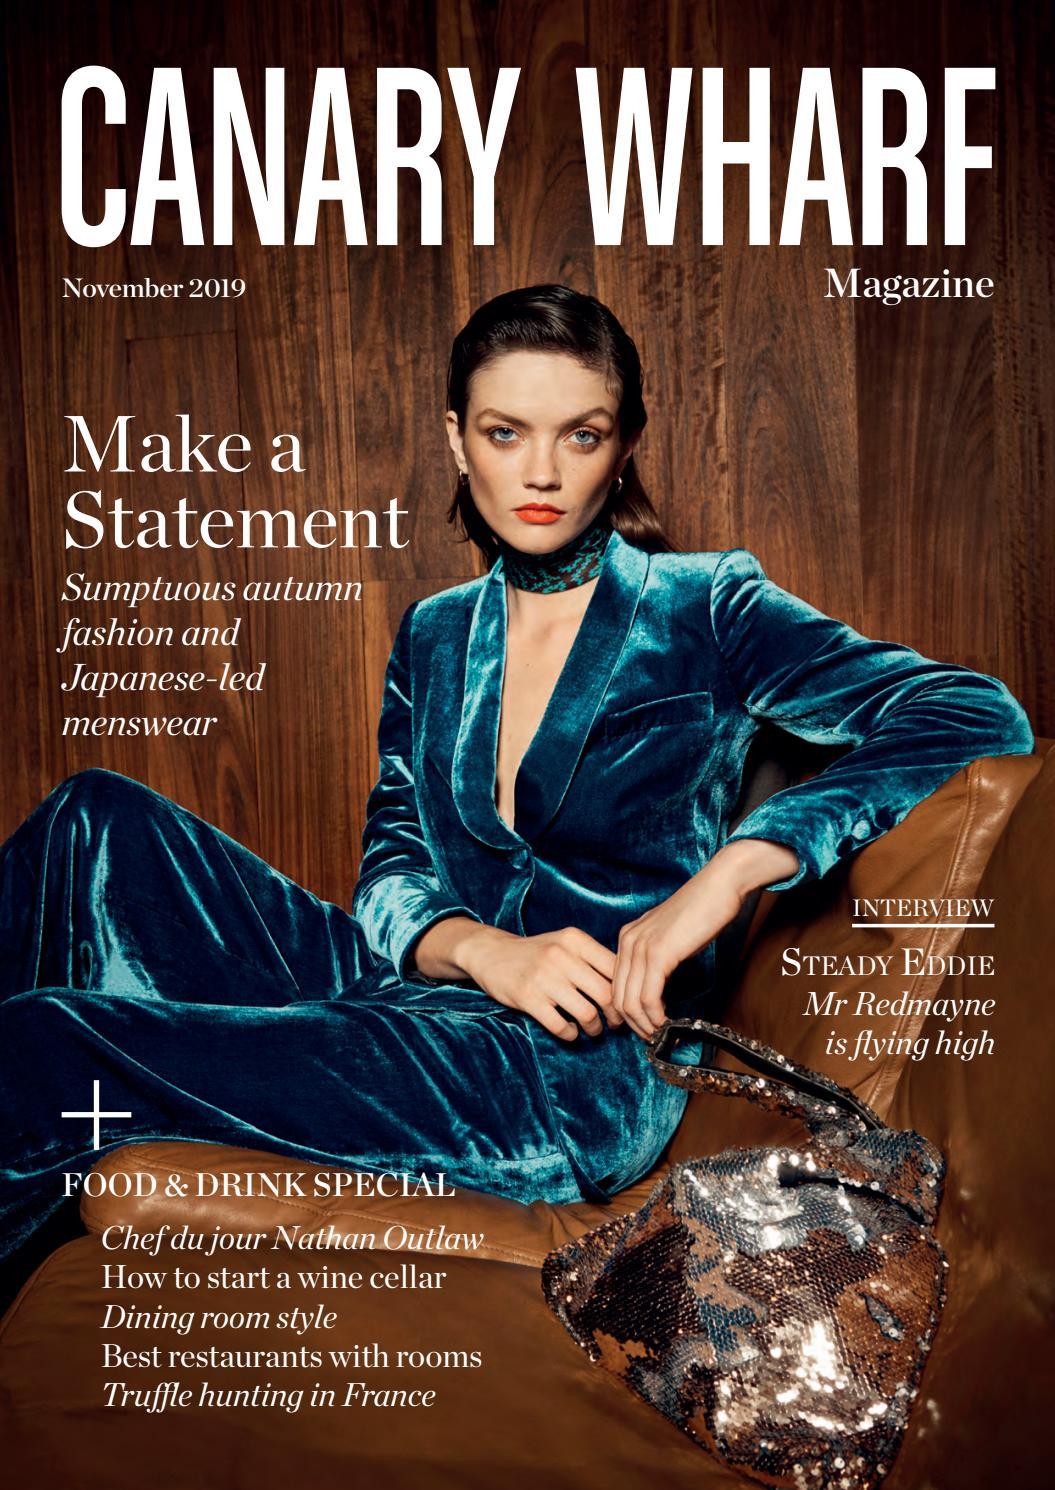 Amber Marie Goetz canary wharf magazine november 2019luxury london media